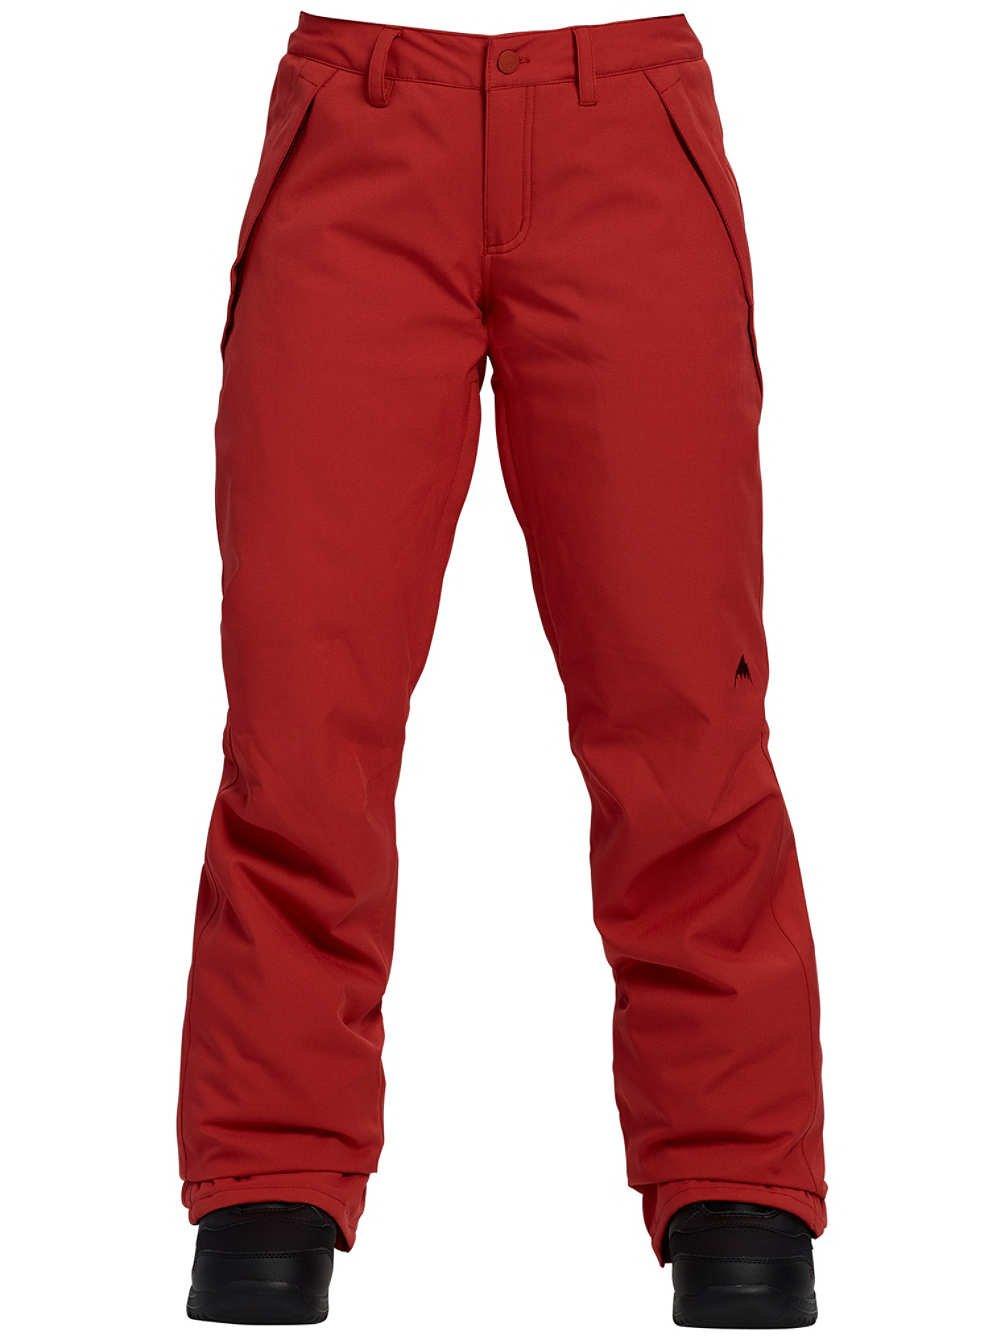 Hot Sauce XL Burton Society Pantalon de Snowboard Femme